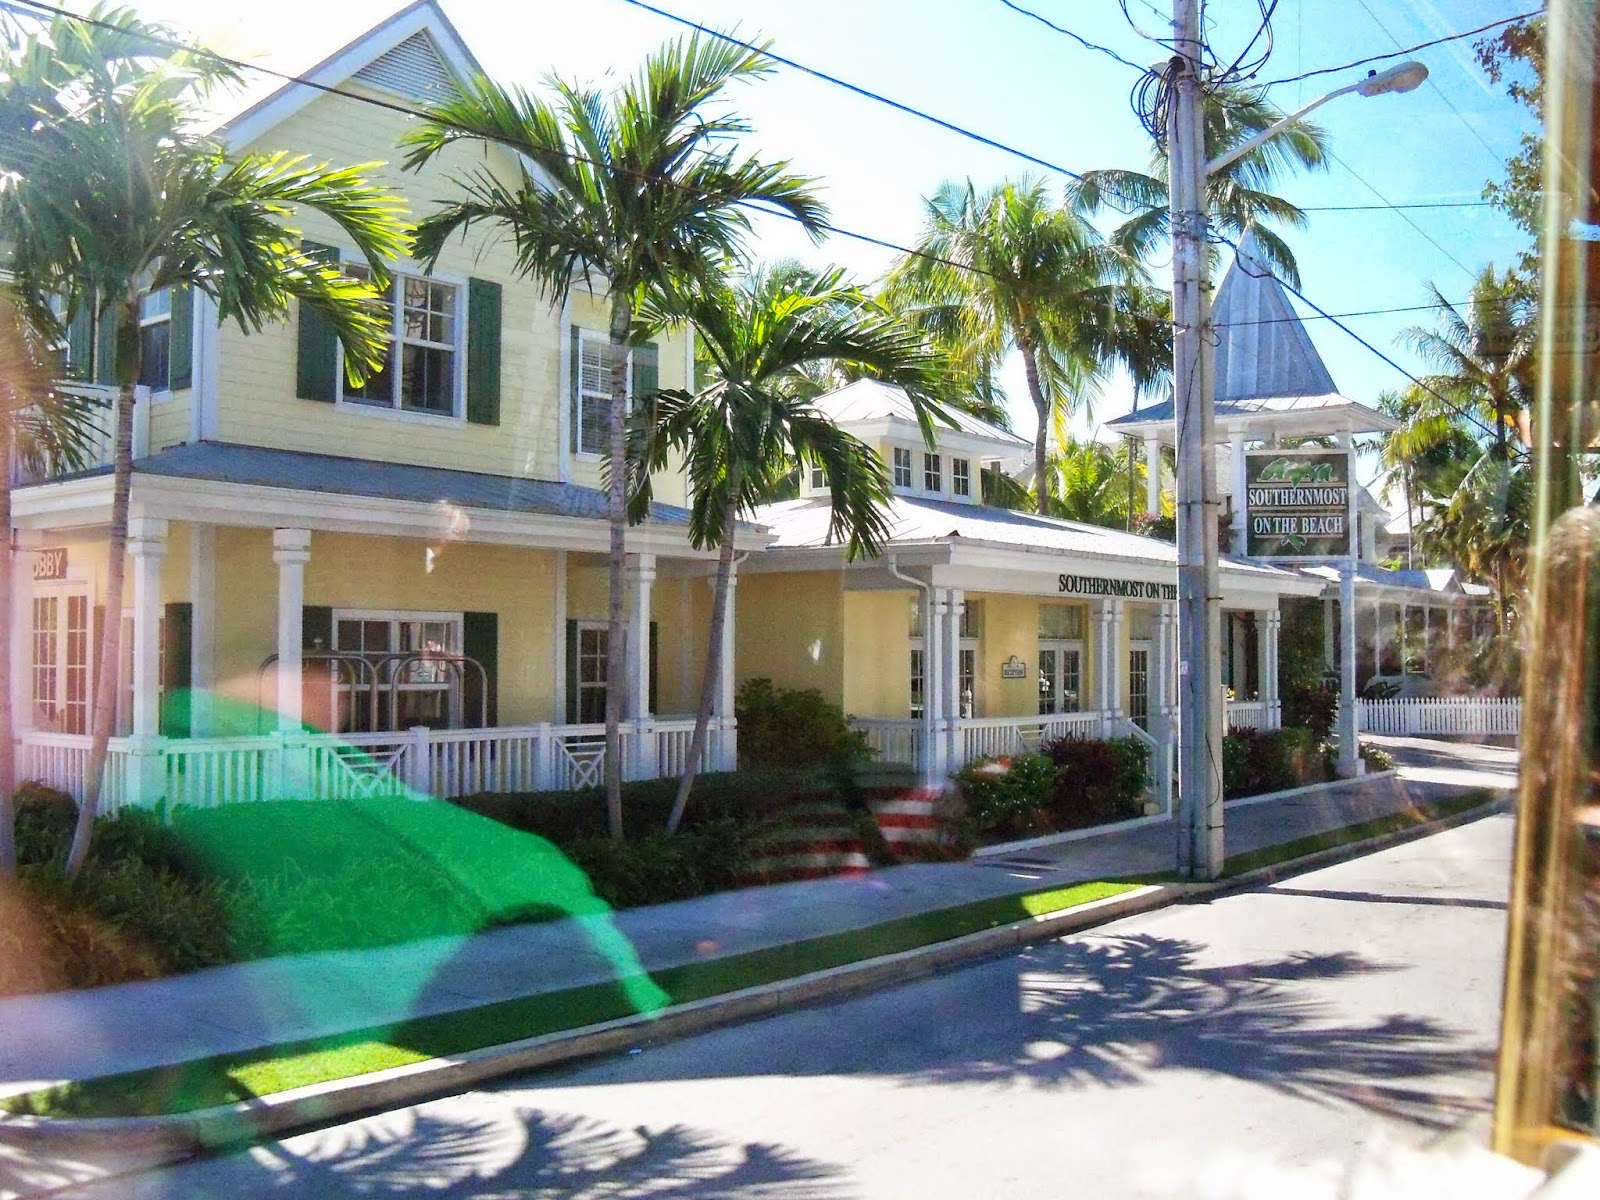 Key West Vacation - 116_5804.JPG